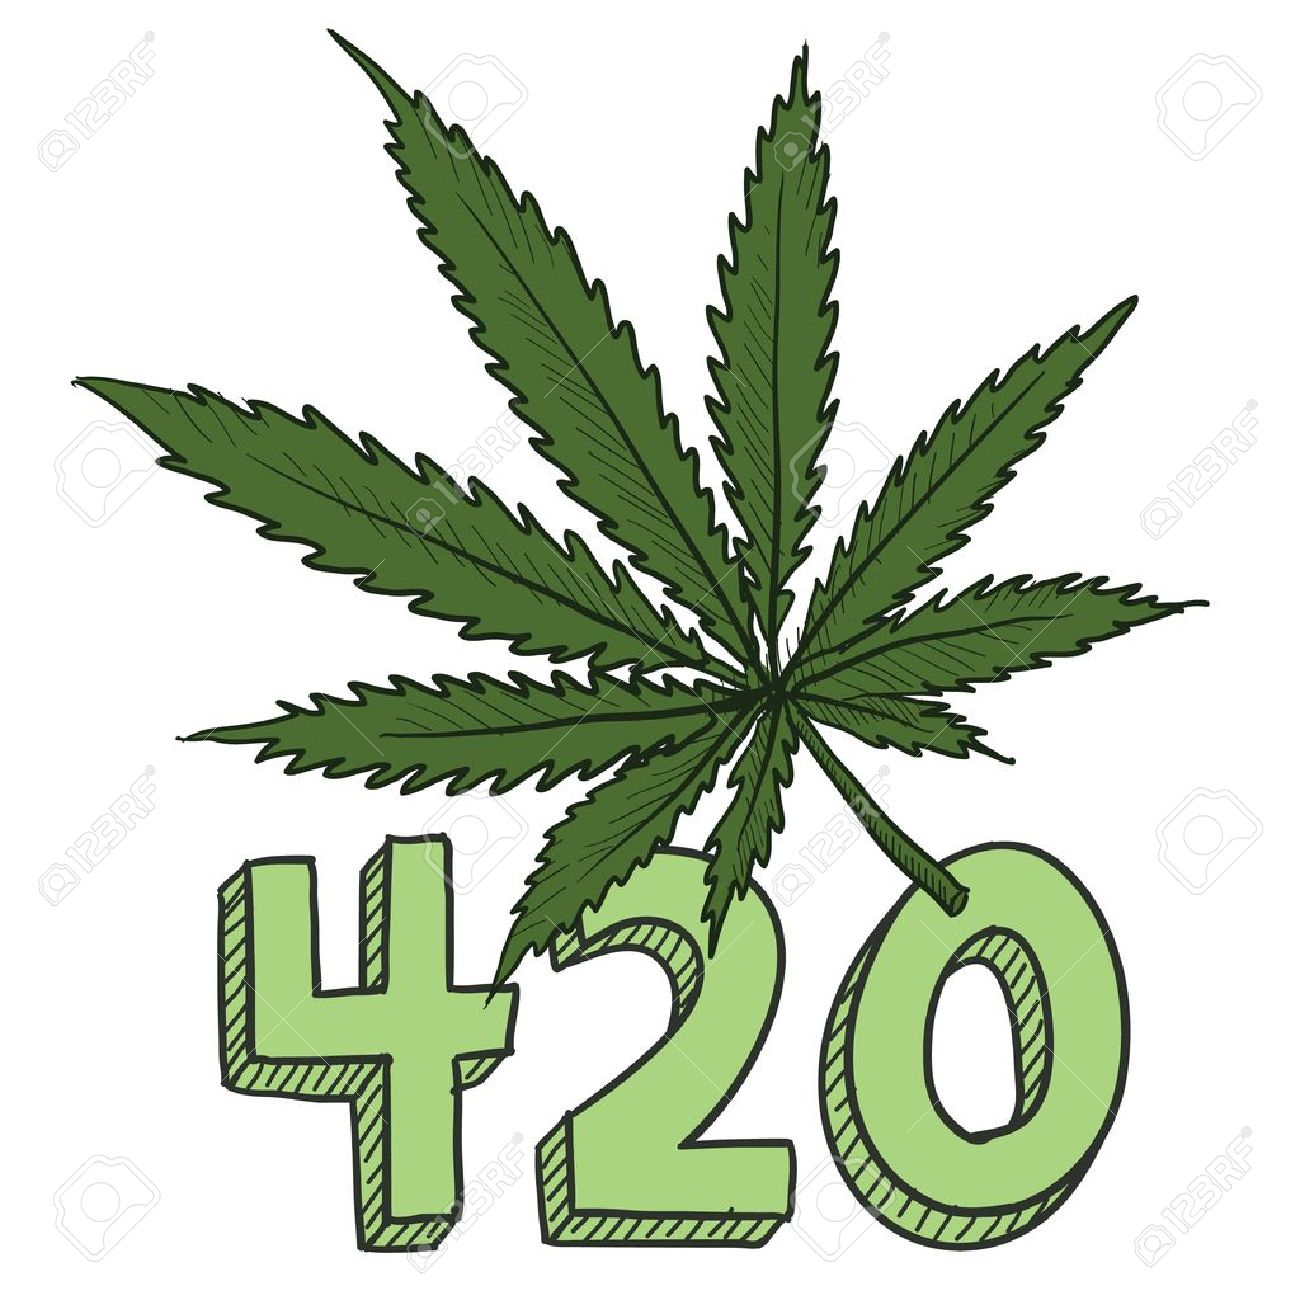 Doodle style 420 marijuana leaf sketch in vector format includes doodle style 420 marijuana leaf sketch in vector format includes text and pot plant stock vector biocorpaavc Choice Image